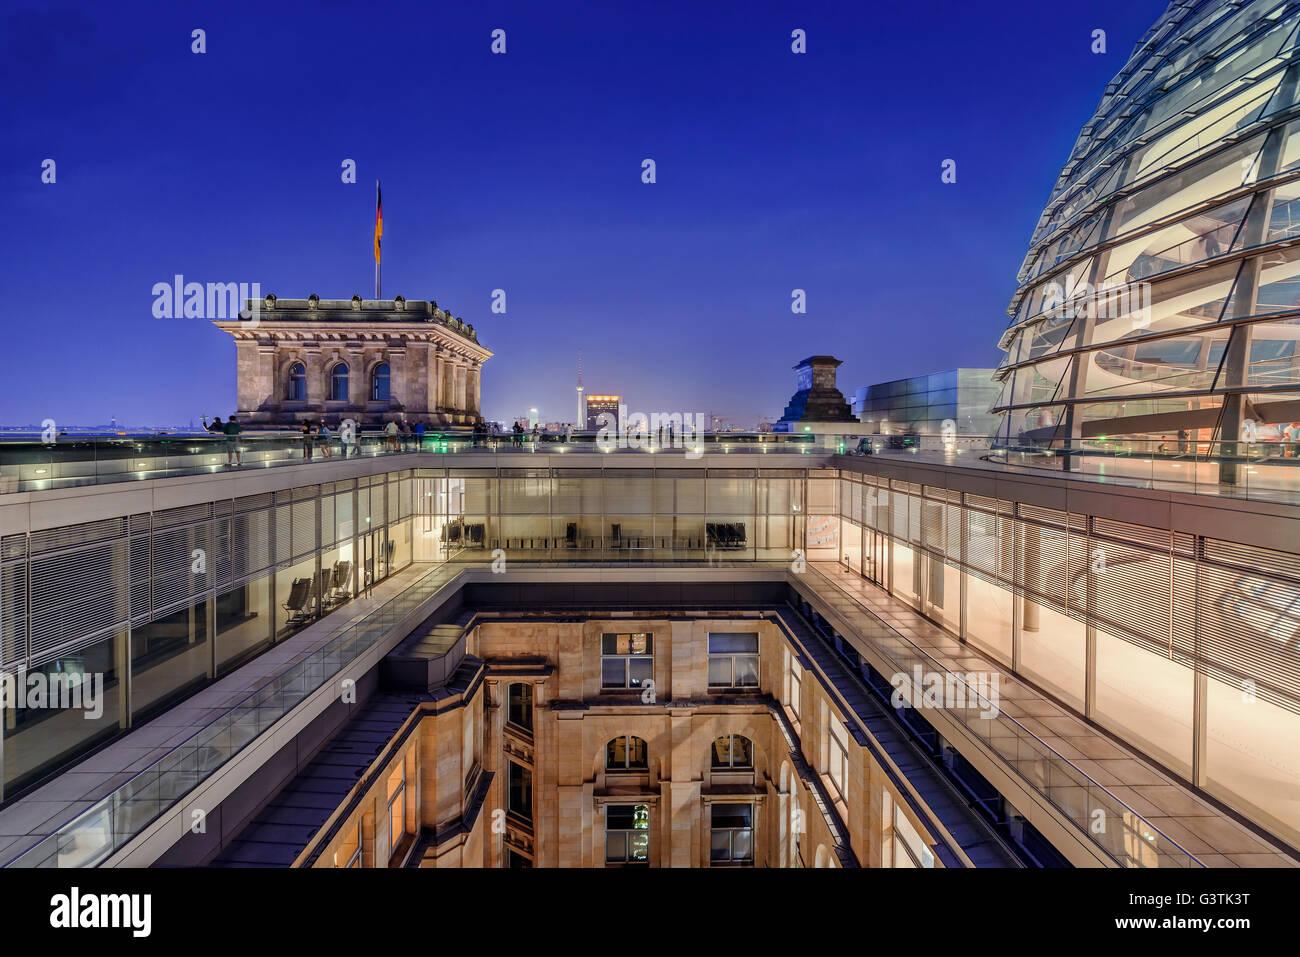 Germany, Berlin, Illuminated Bundestag roof - Stock Image